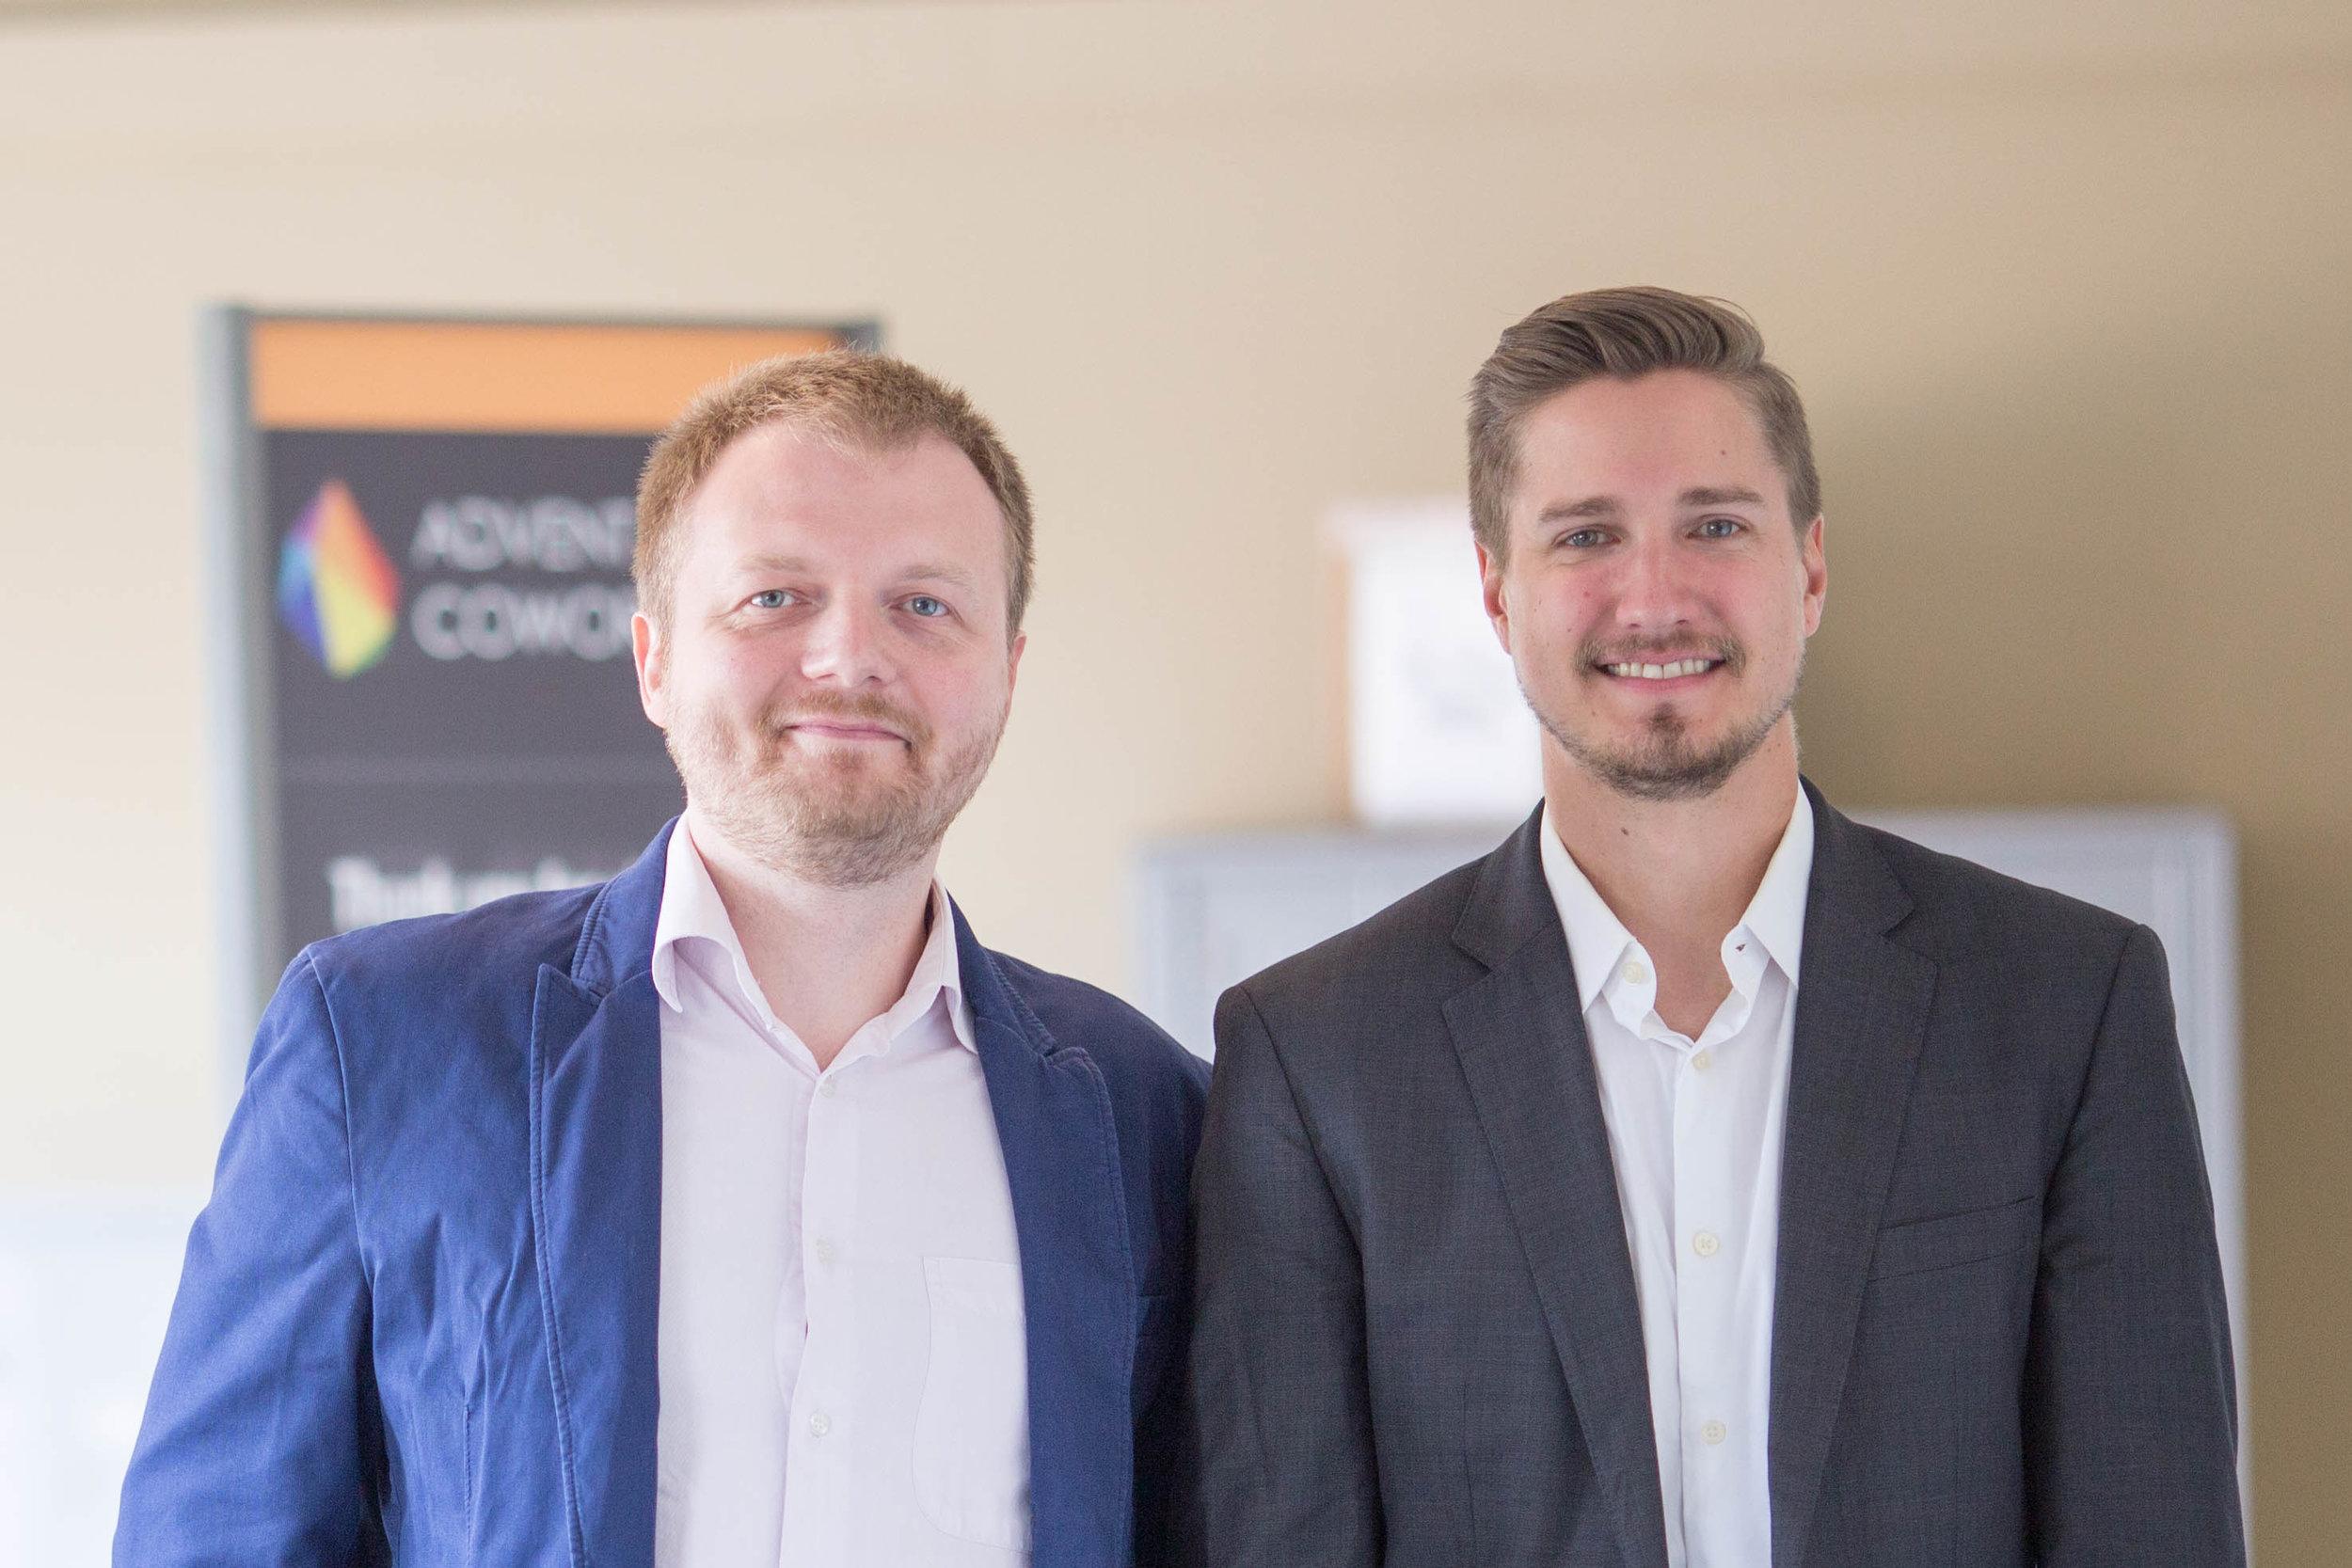 The Community MBA Founders: Igor Gorlatov and Kevin Giriunas